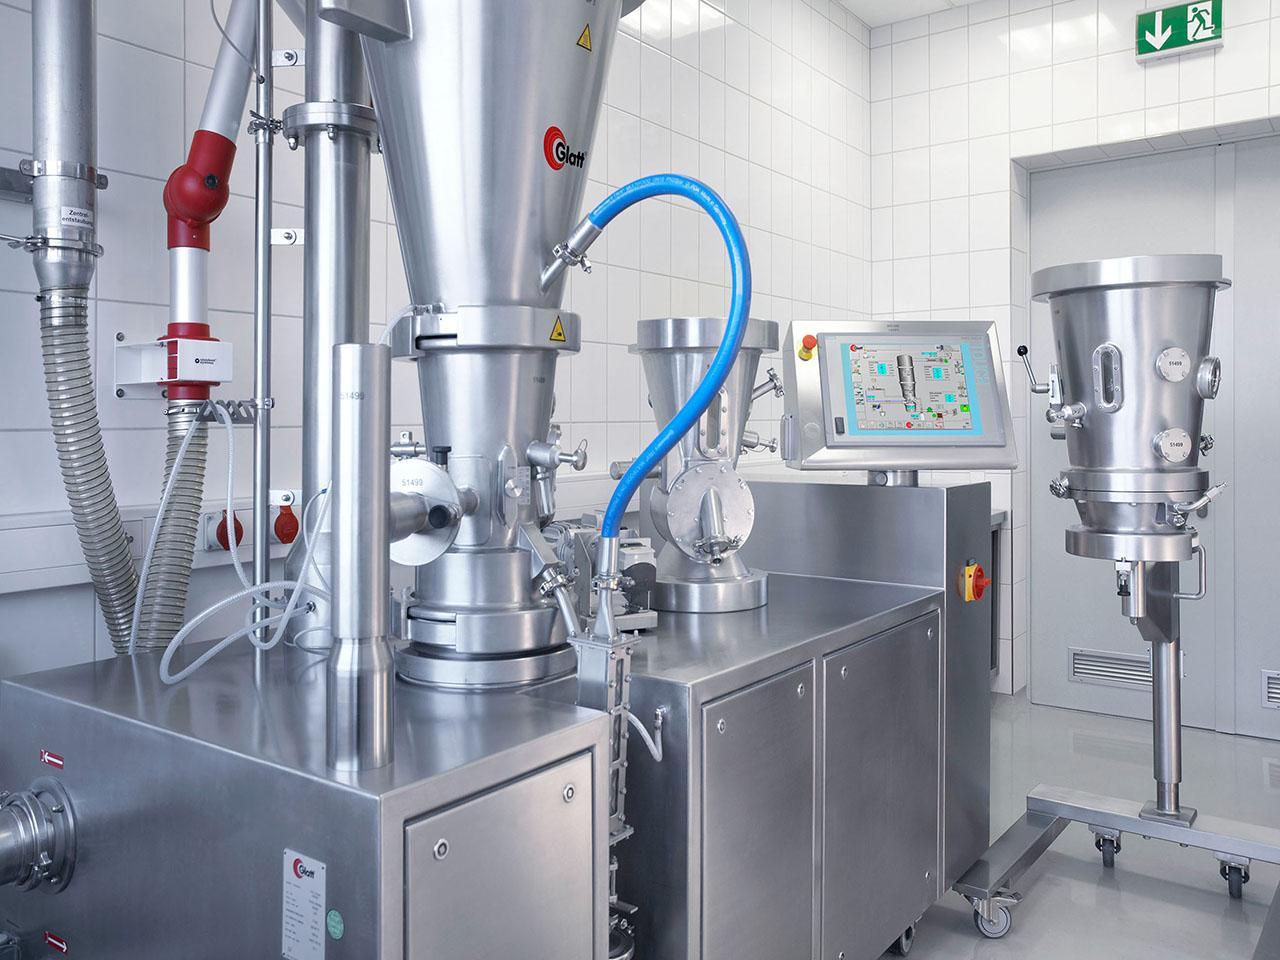 Glatt mobile laboratory unit ProCell LabSystem